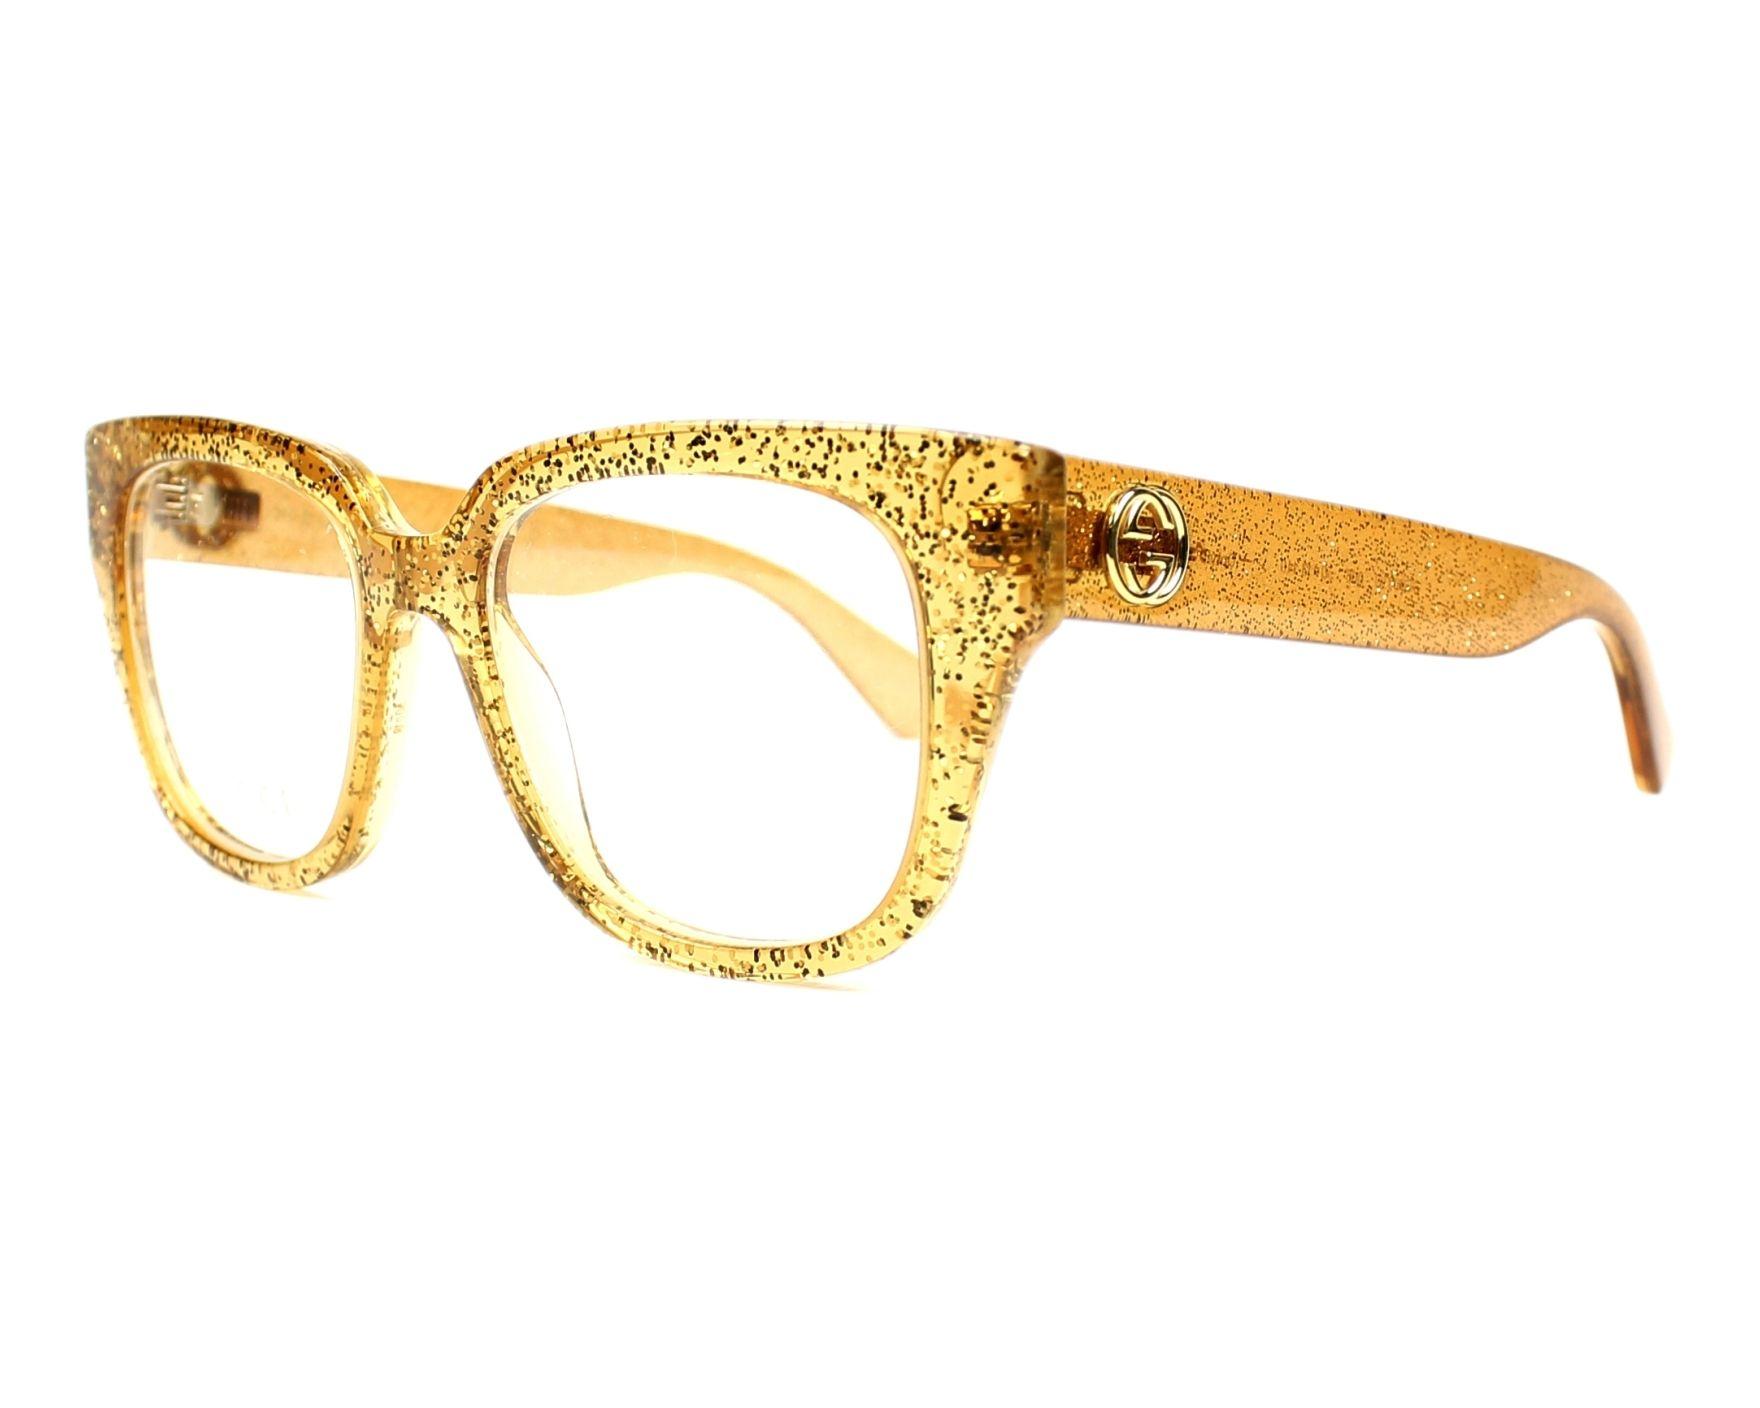 0656794d7dd ... Sunglasses 3675 Frame Black Embossed Gold. Buy Gucci Eyeglasses GG-0037-O  006 Online - Visionet